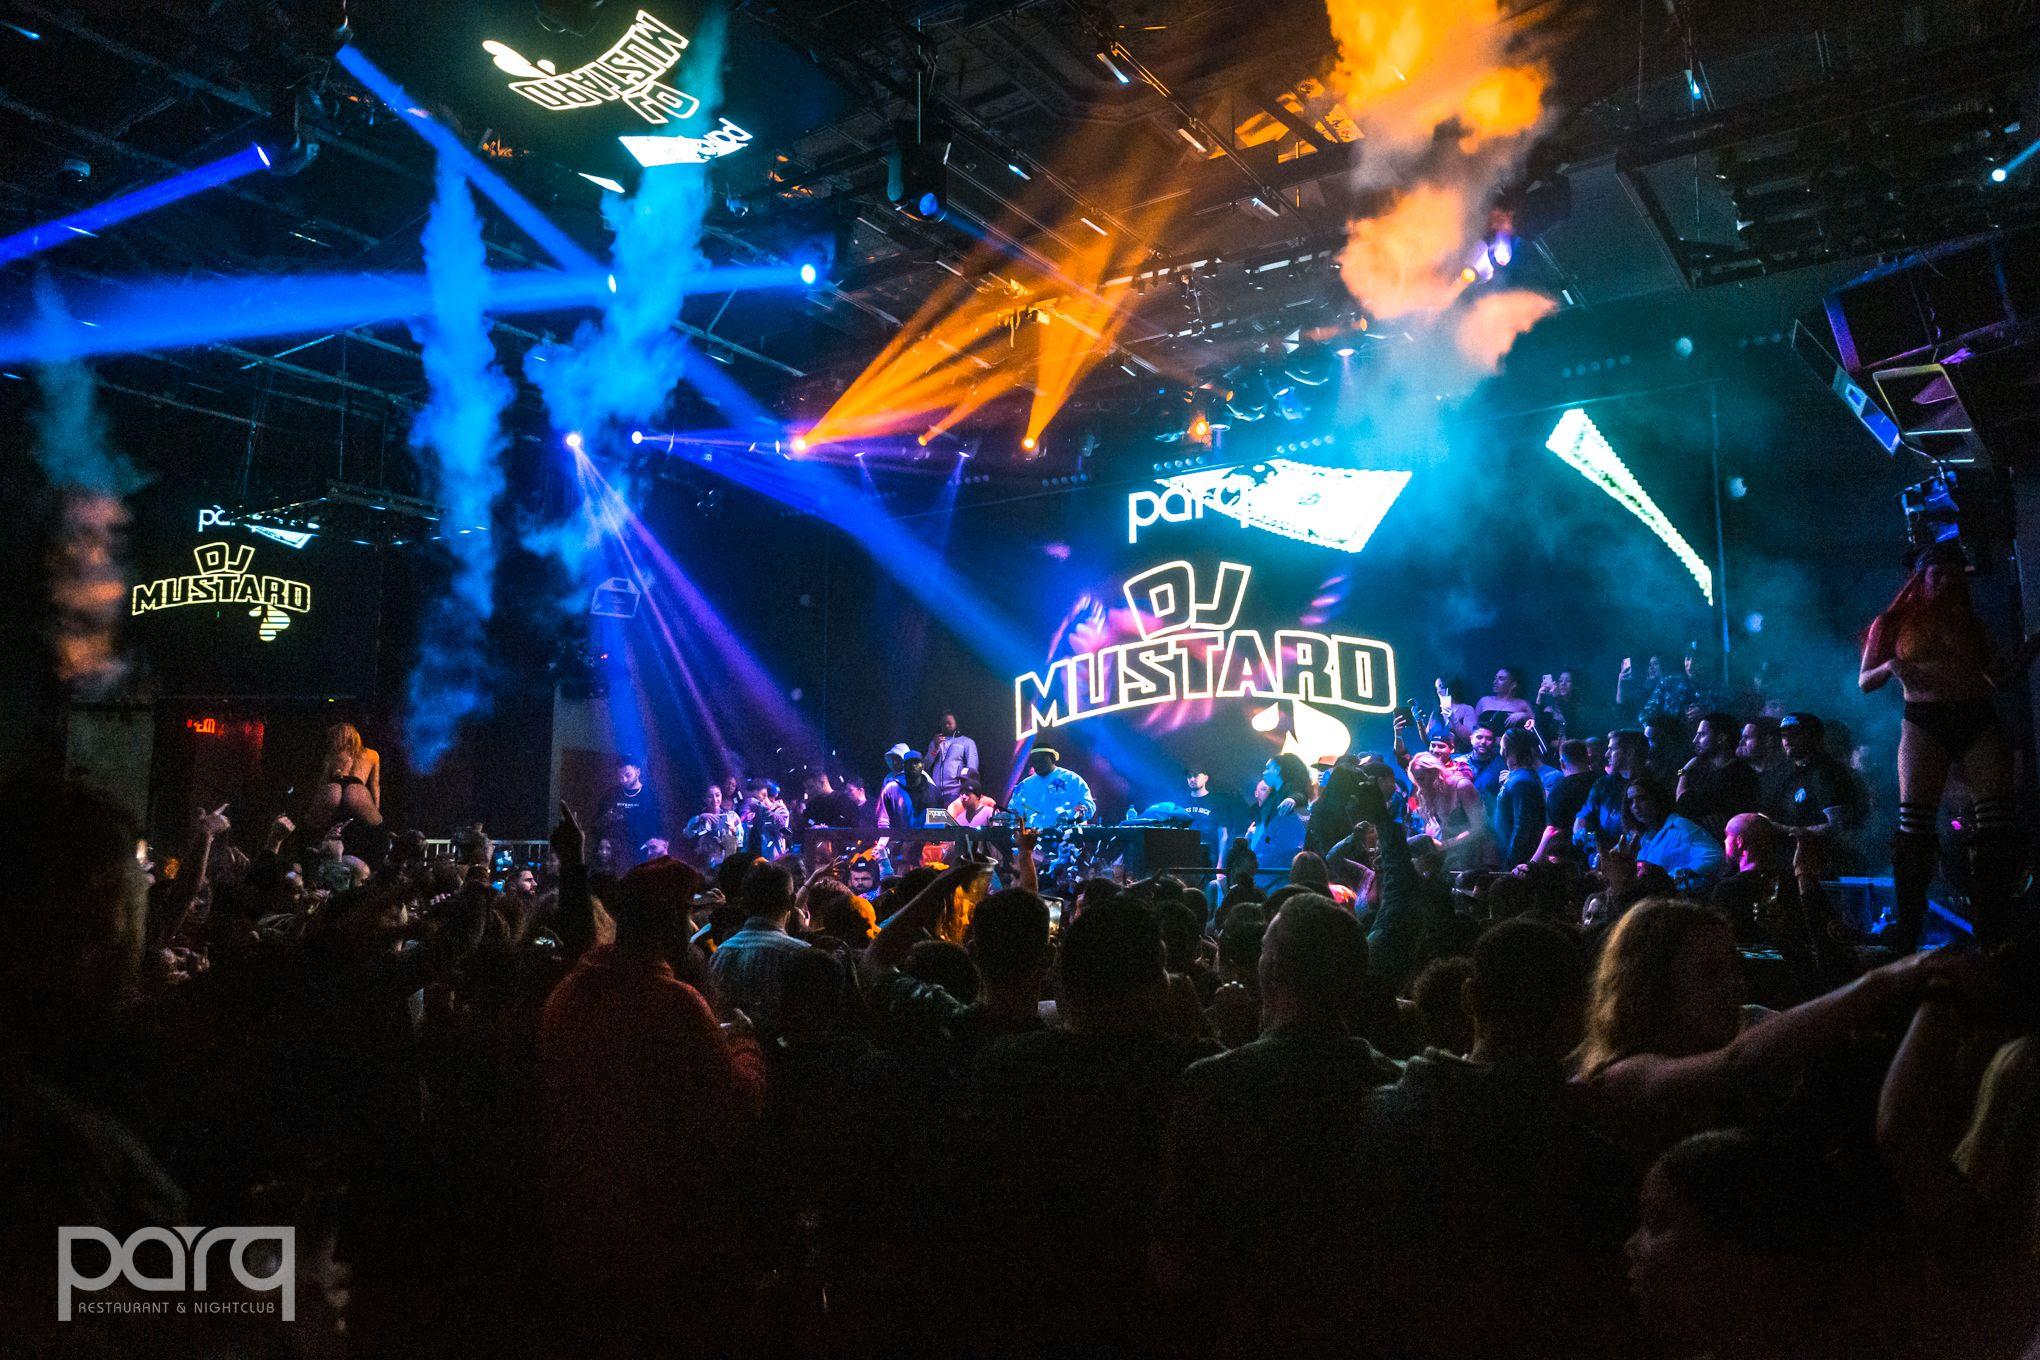 11.27.19 Parq - DJ Mustard-2.jpg